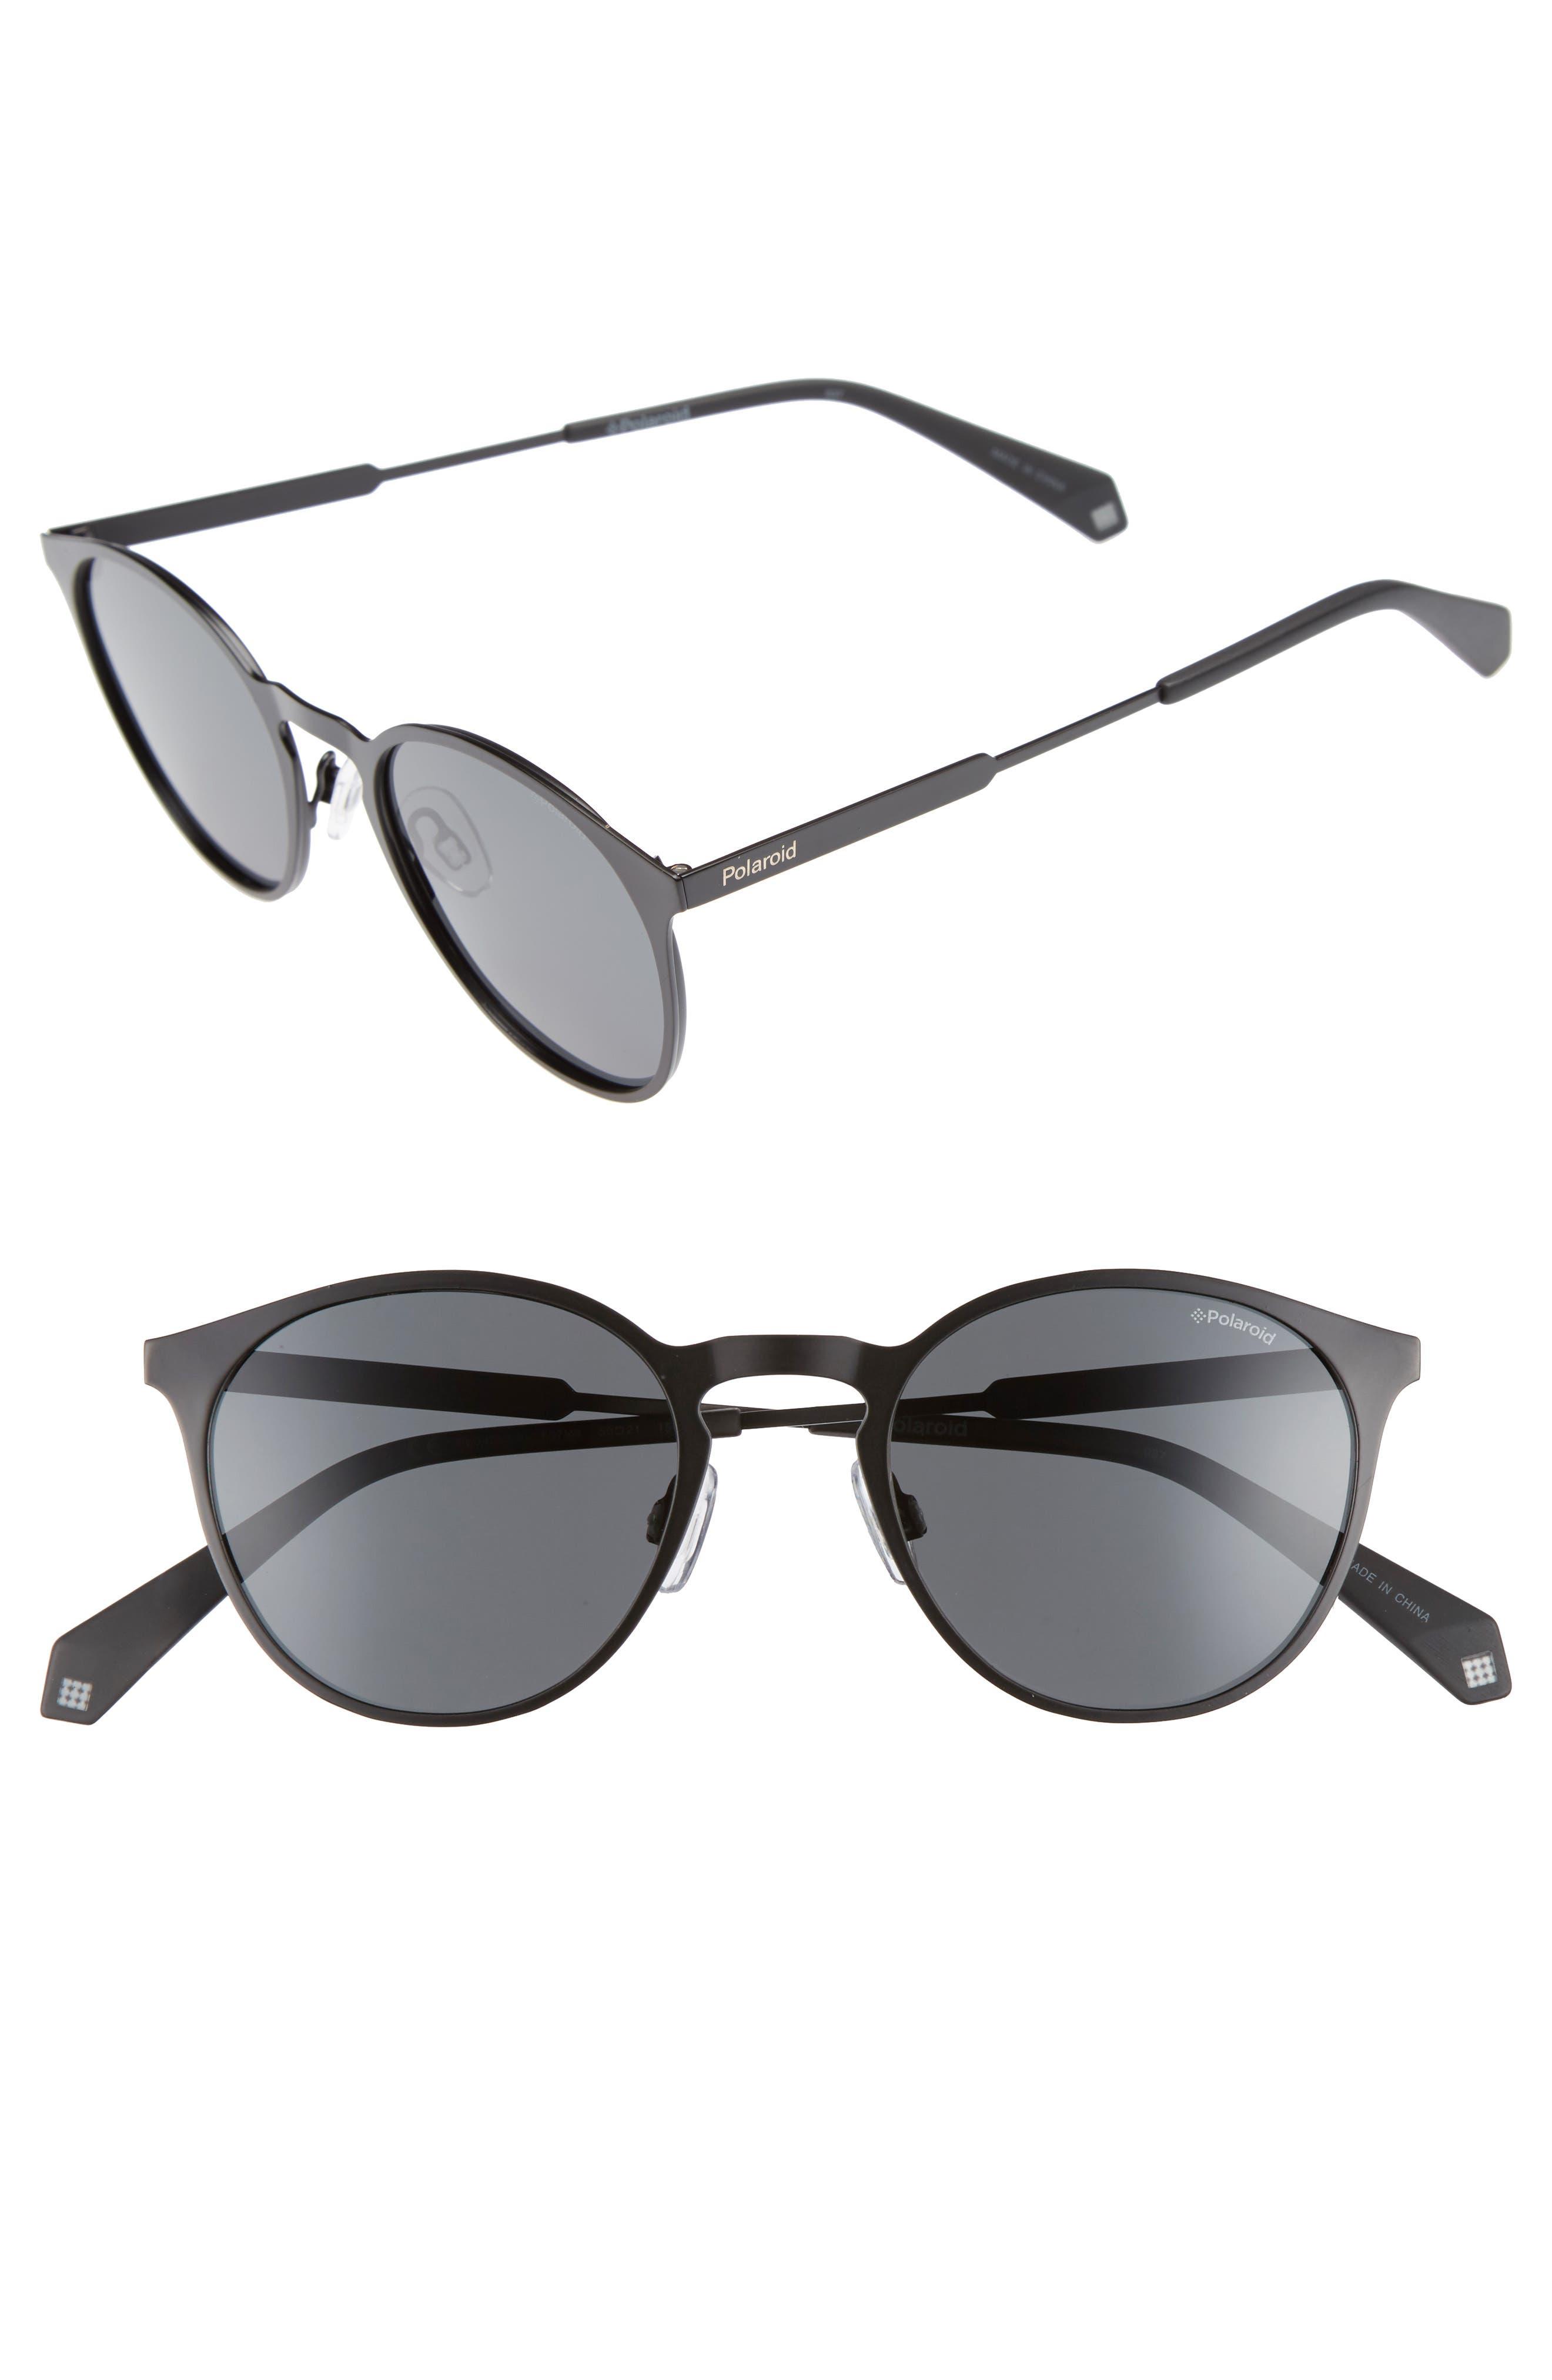 POLAROID EYEWEAR,                             Polaroid 50mm Round Polarized Sunglasses,                             Main thumbnail 1, color,                             002